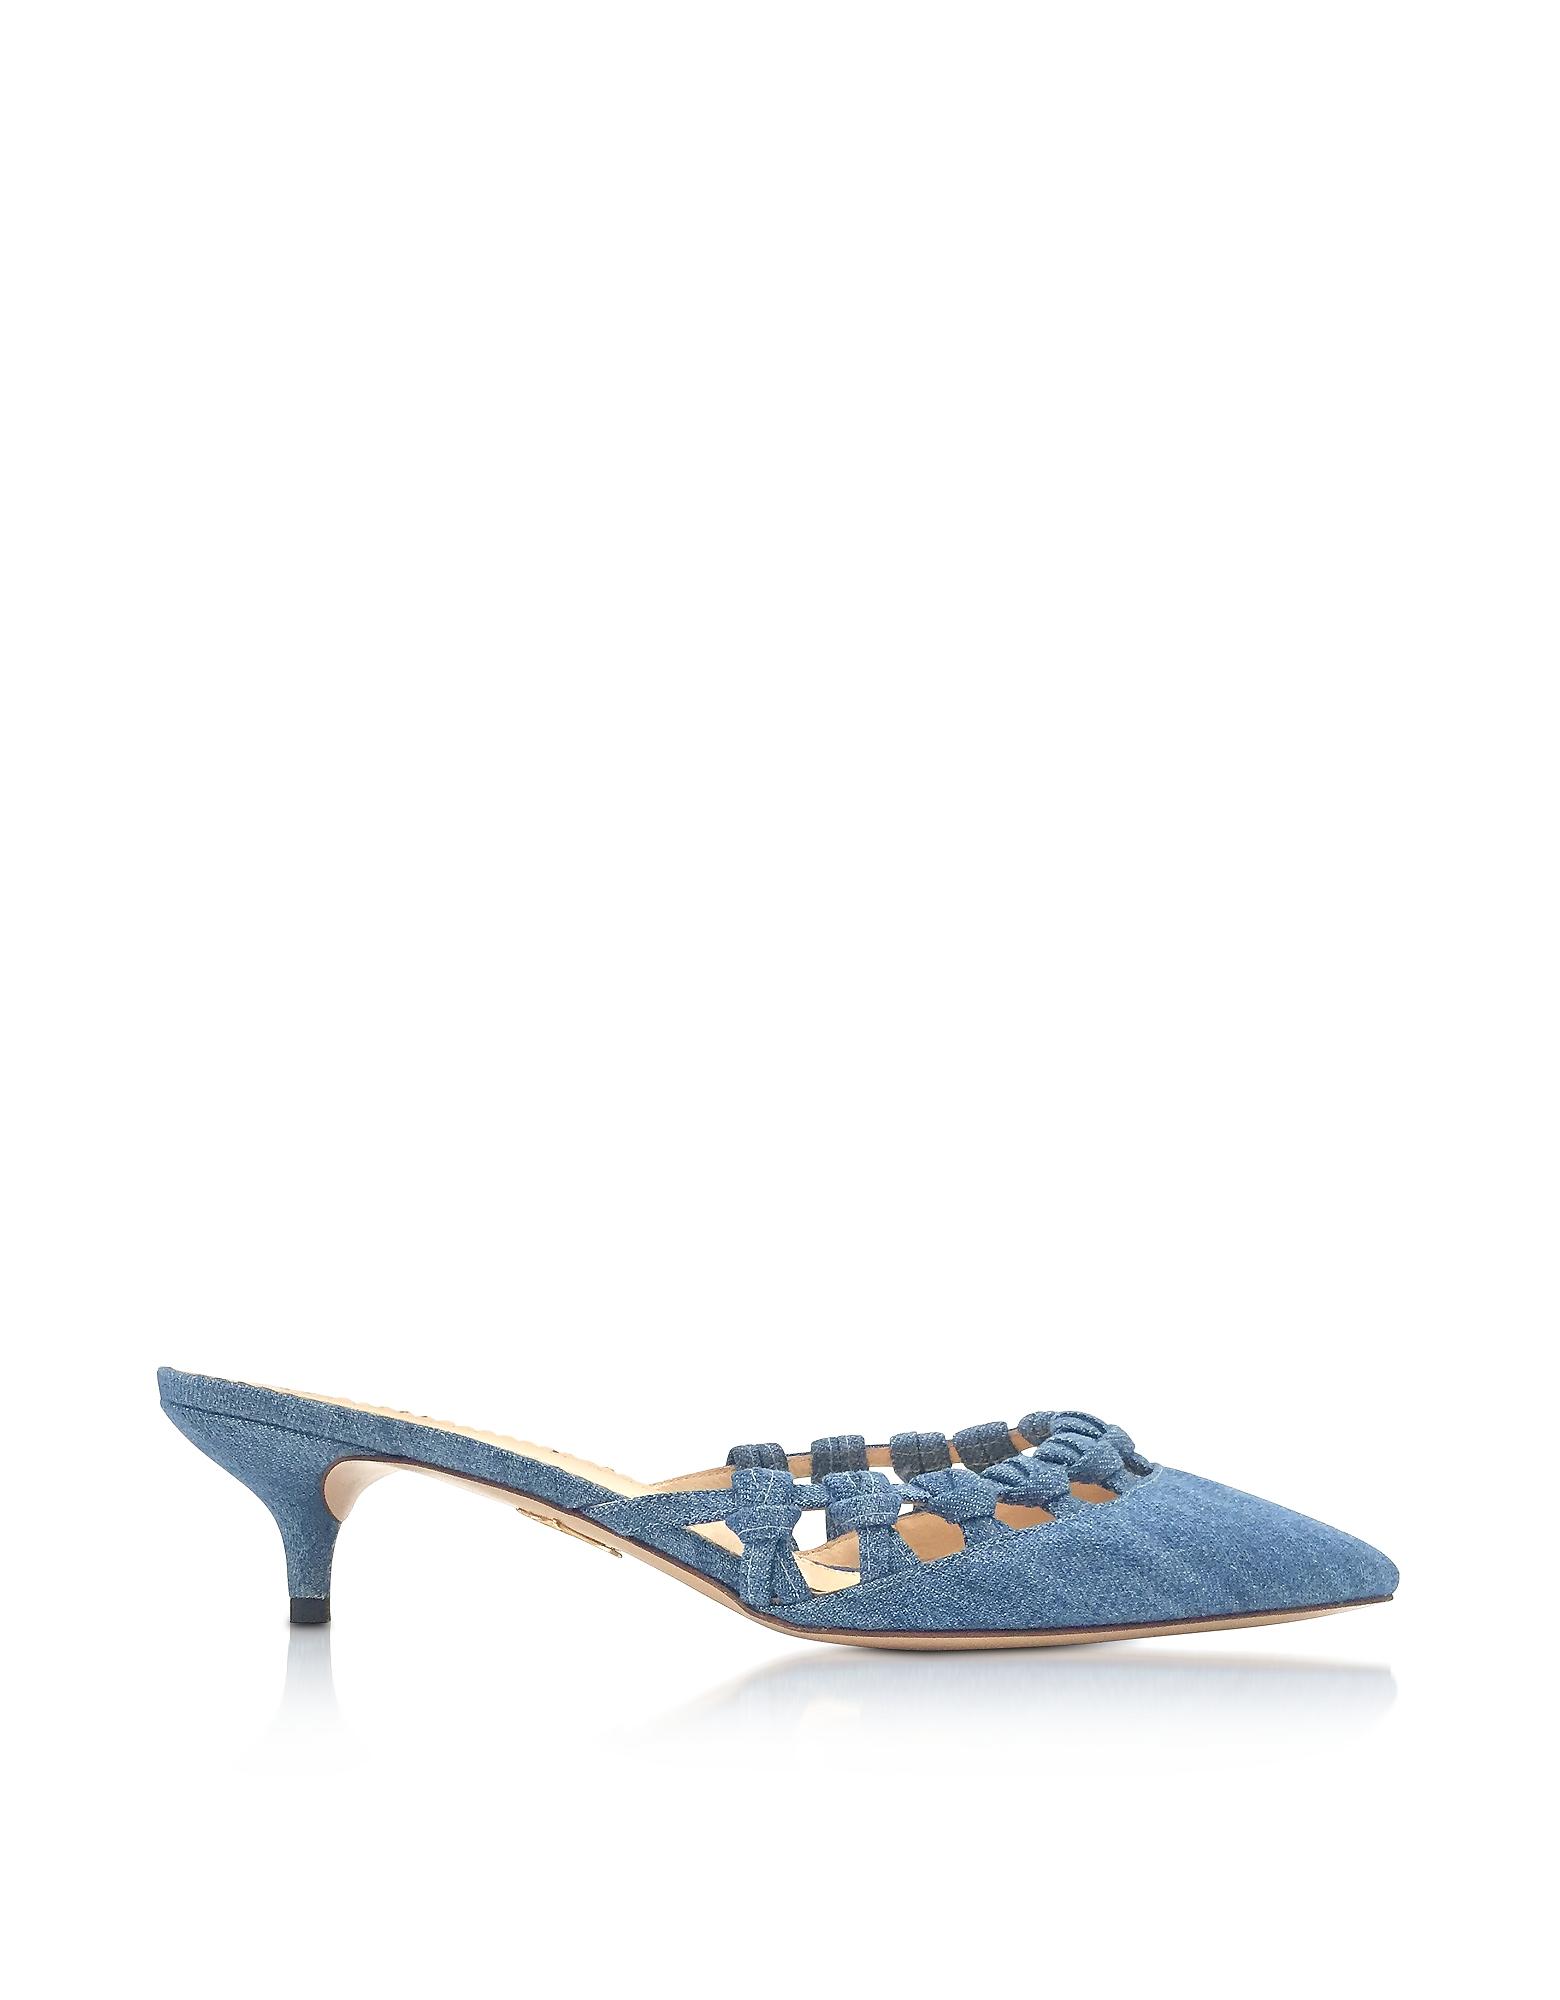 Charlotte Olympia Shoes, Patti Denim Mid-Heel Pointy Mule